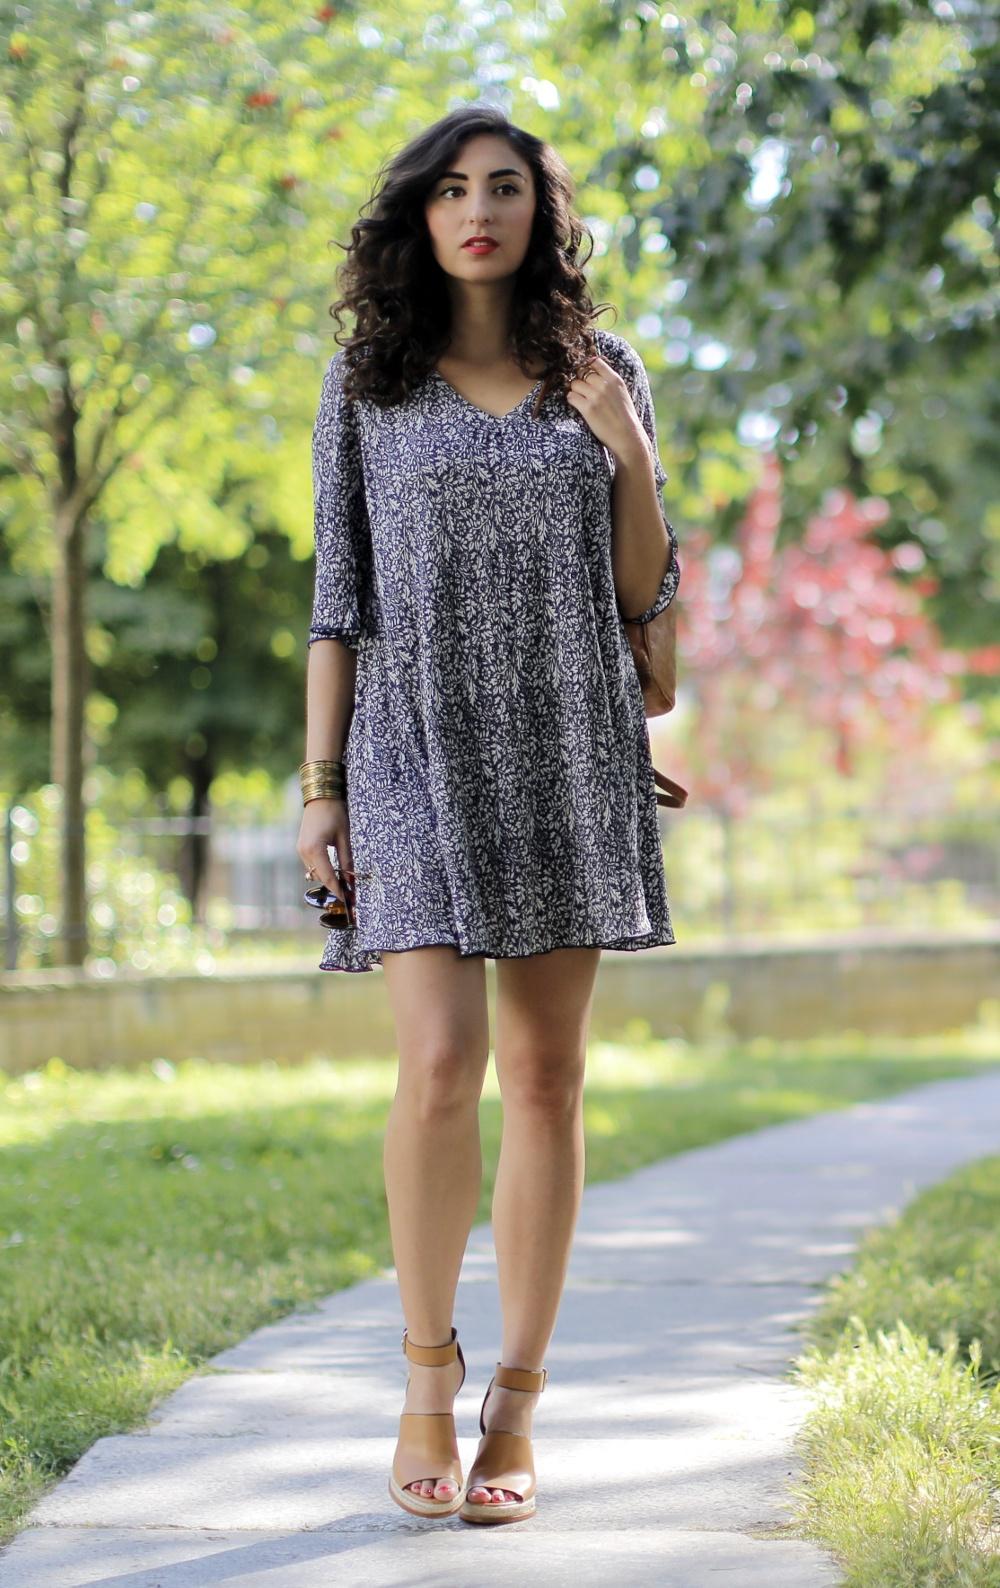 zara bast wedges summer look mango kleid mango a-line dress hippie kleid paisley print modeblog outfitpost